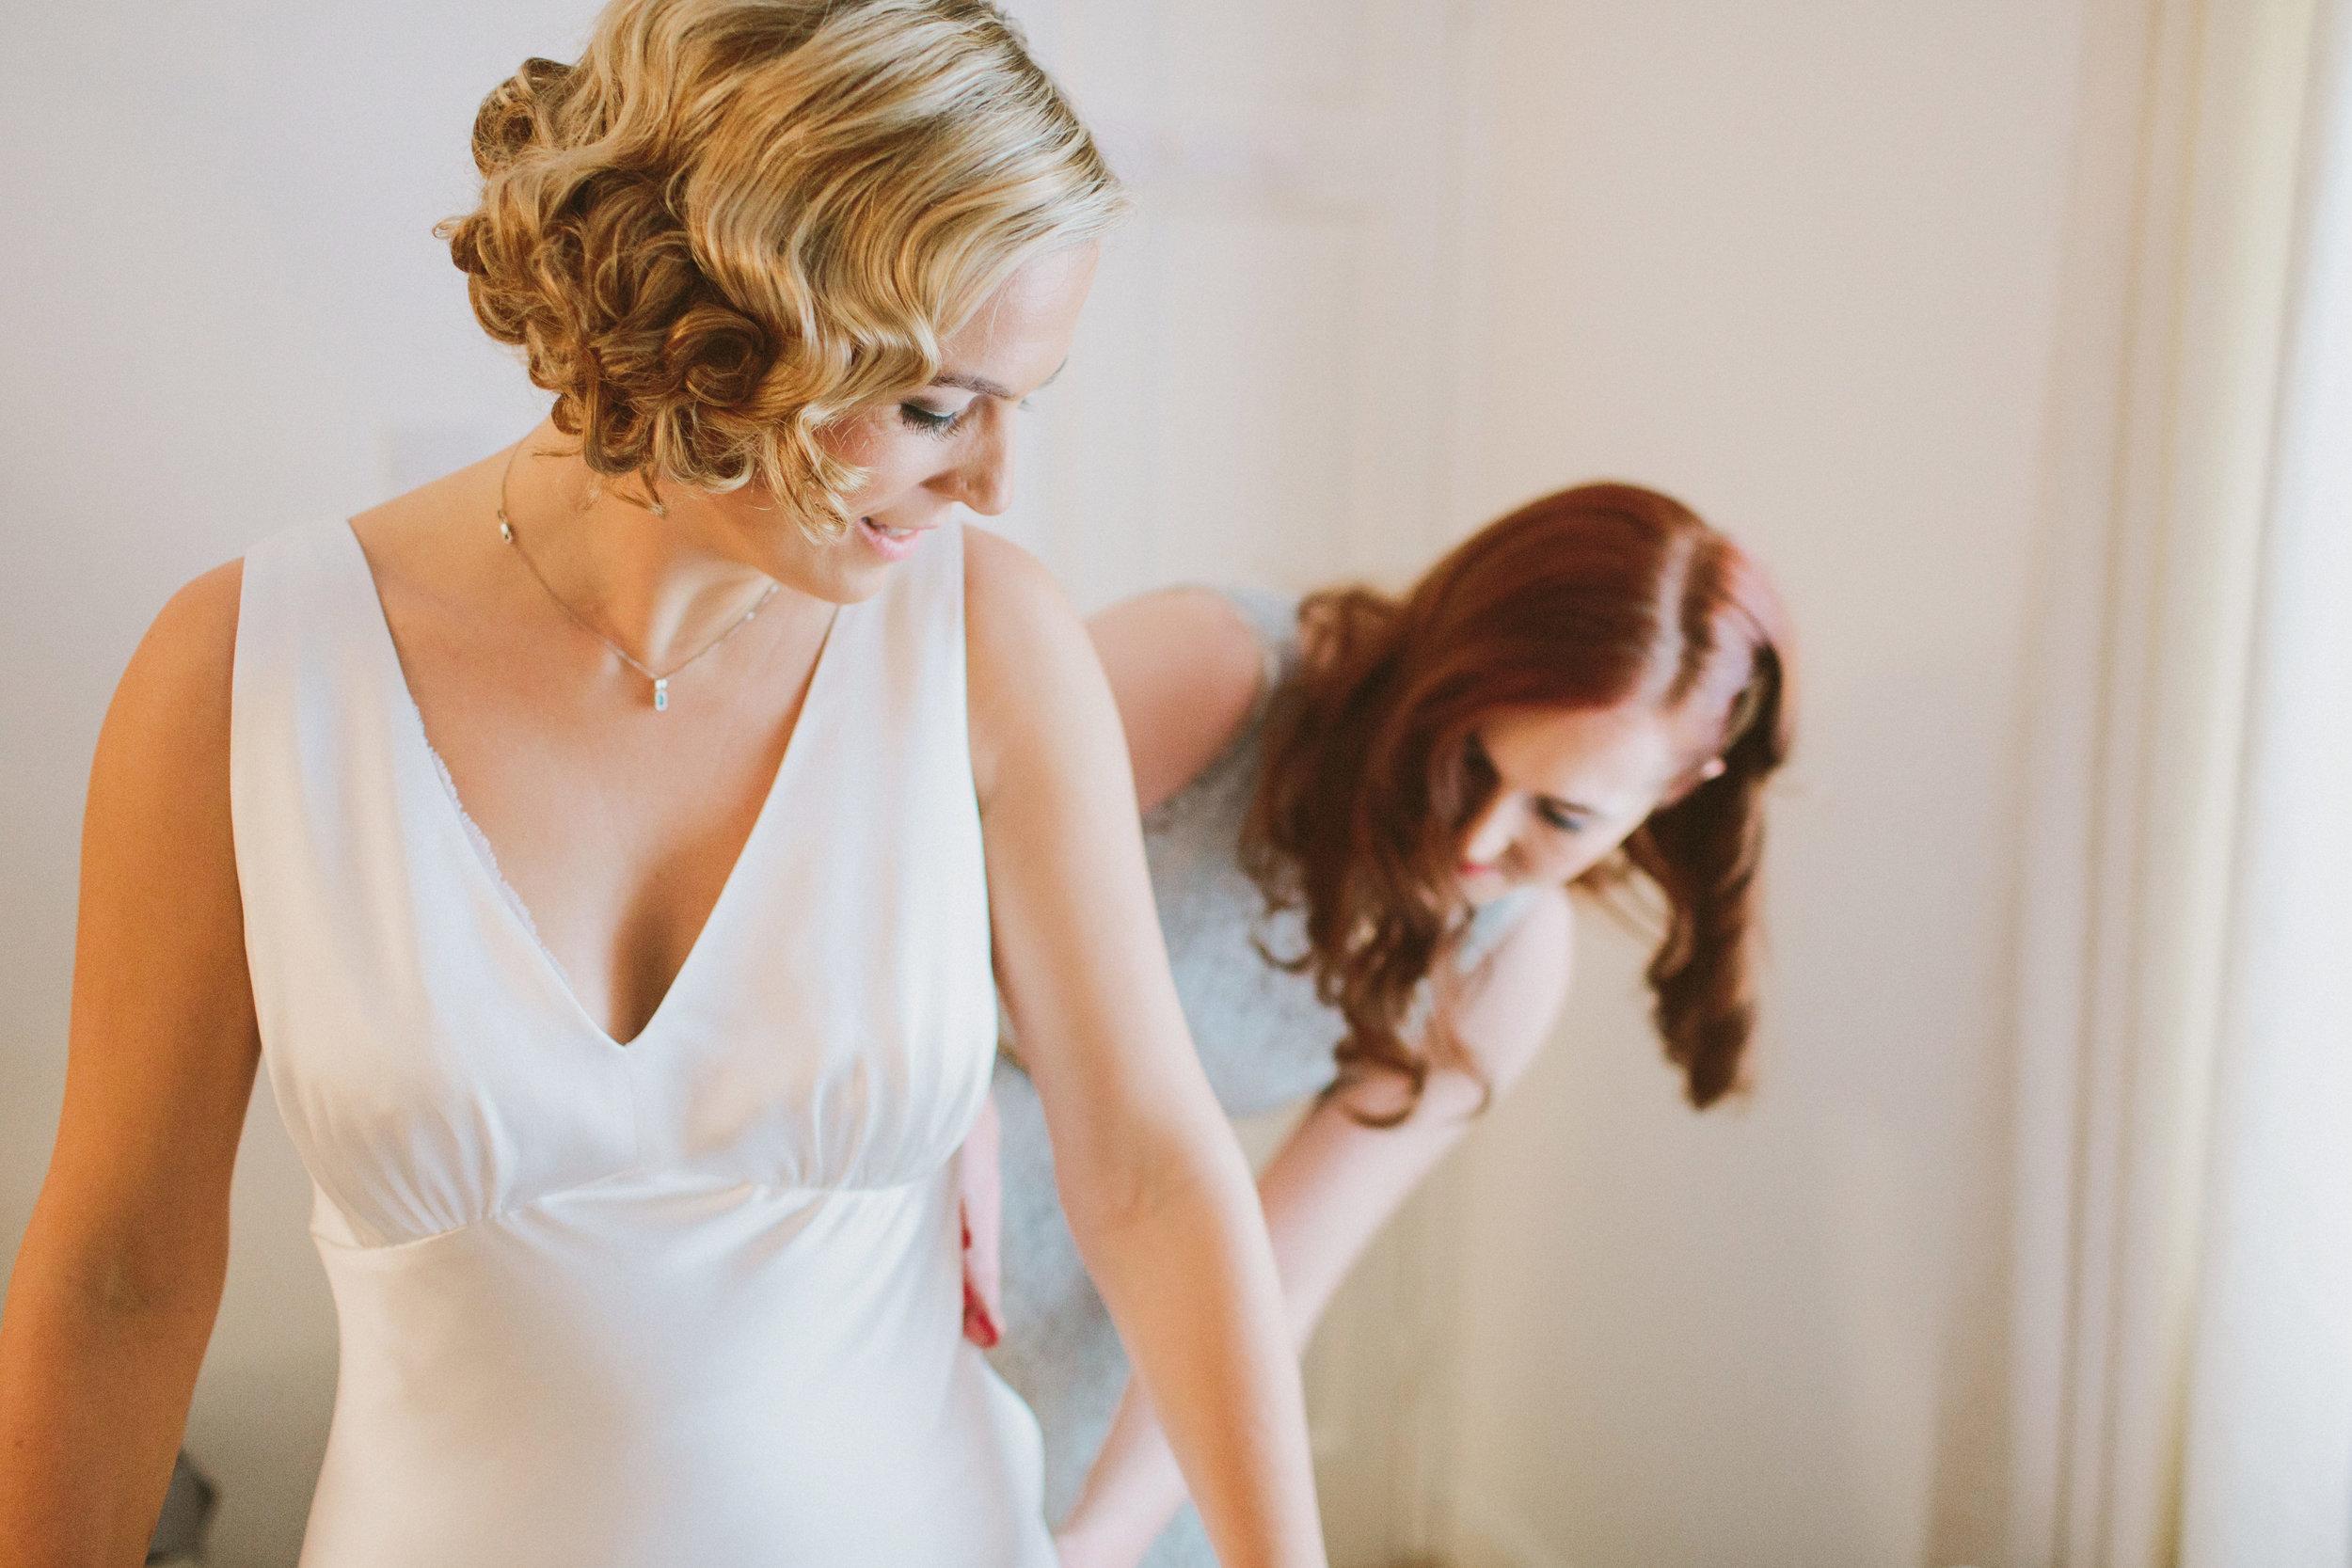 Jo-Peak-District-Autumn-Wedding-Bespoke-Vintage-Bias-Wedding-Gown-Lace-Jacket-Susanna-Greening-Matlock-5